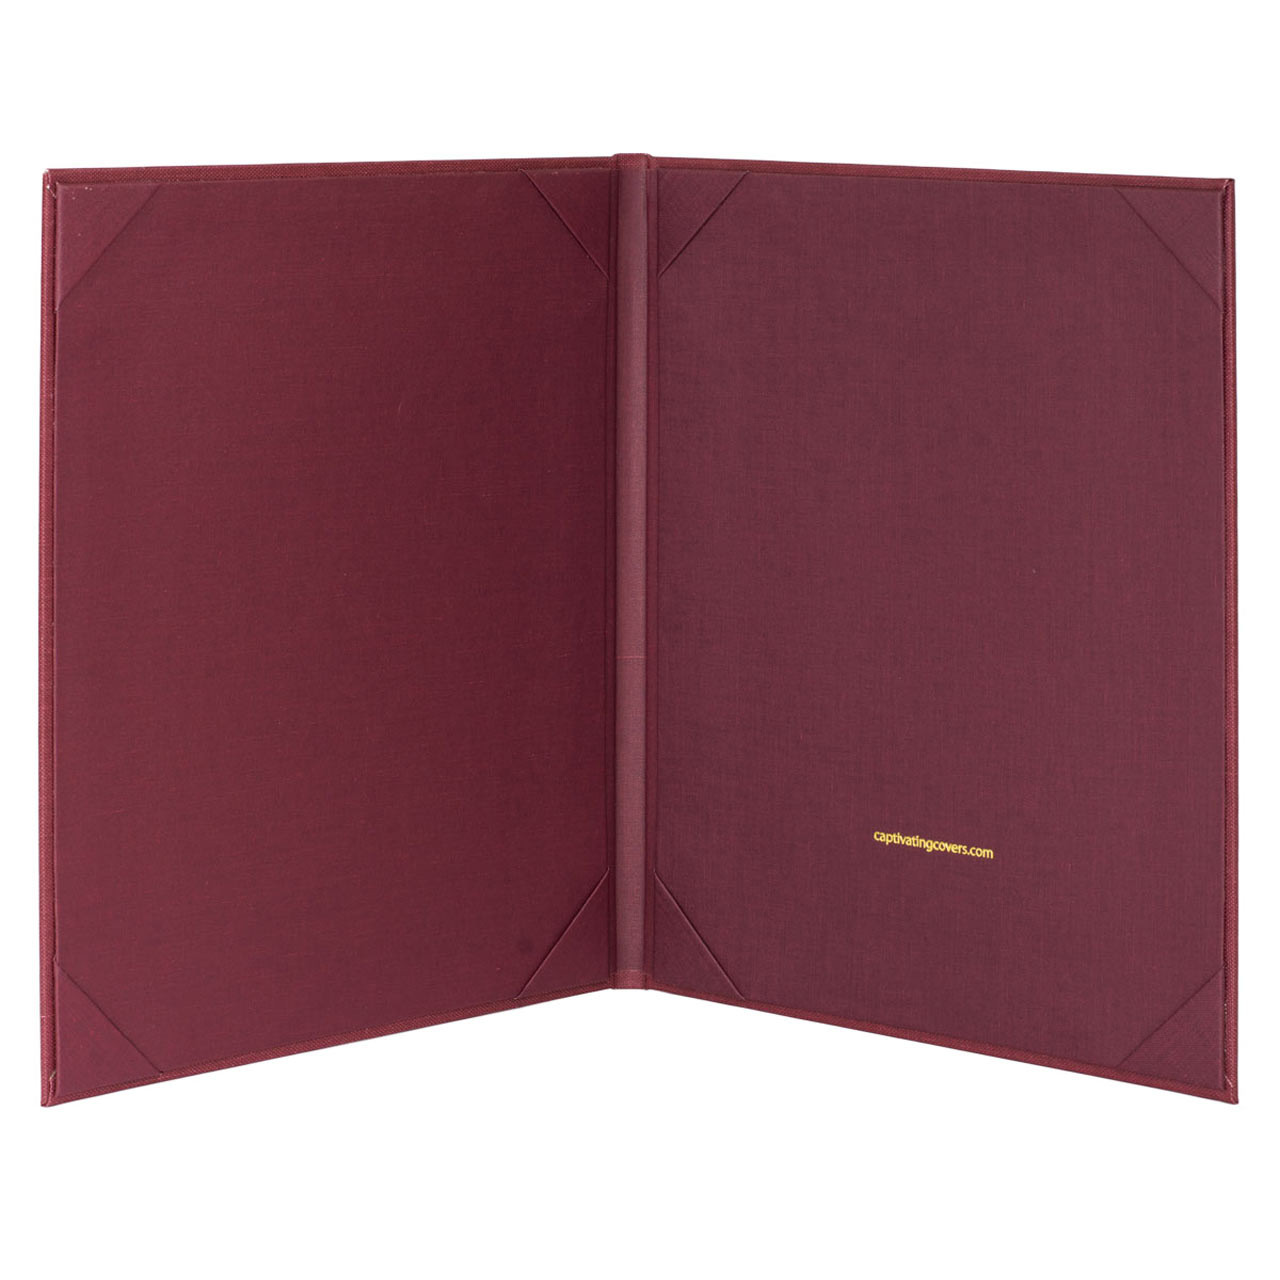 Retro Menu Cover (Burgundy) 8.5 in. x 11 in. Insert, 2-Panel (inside view)